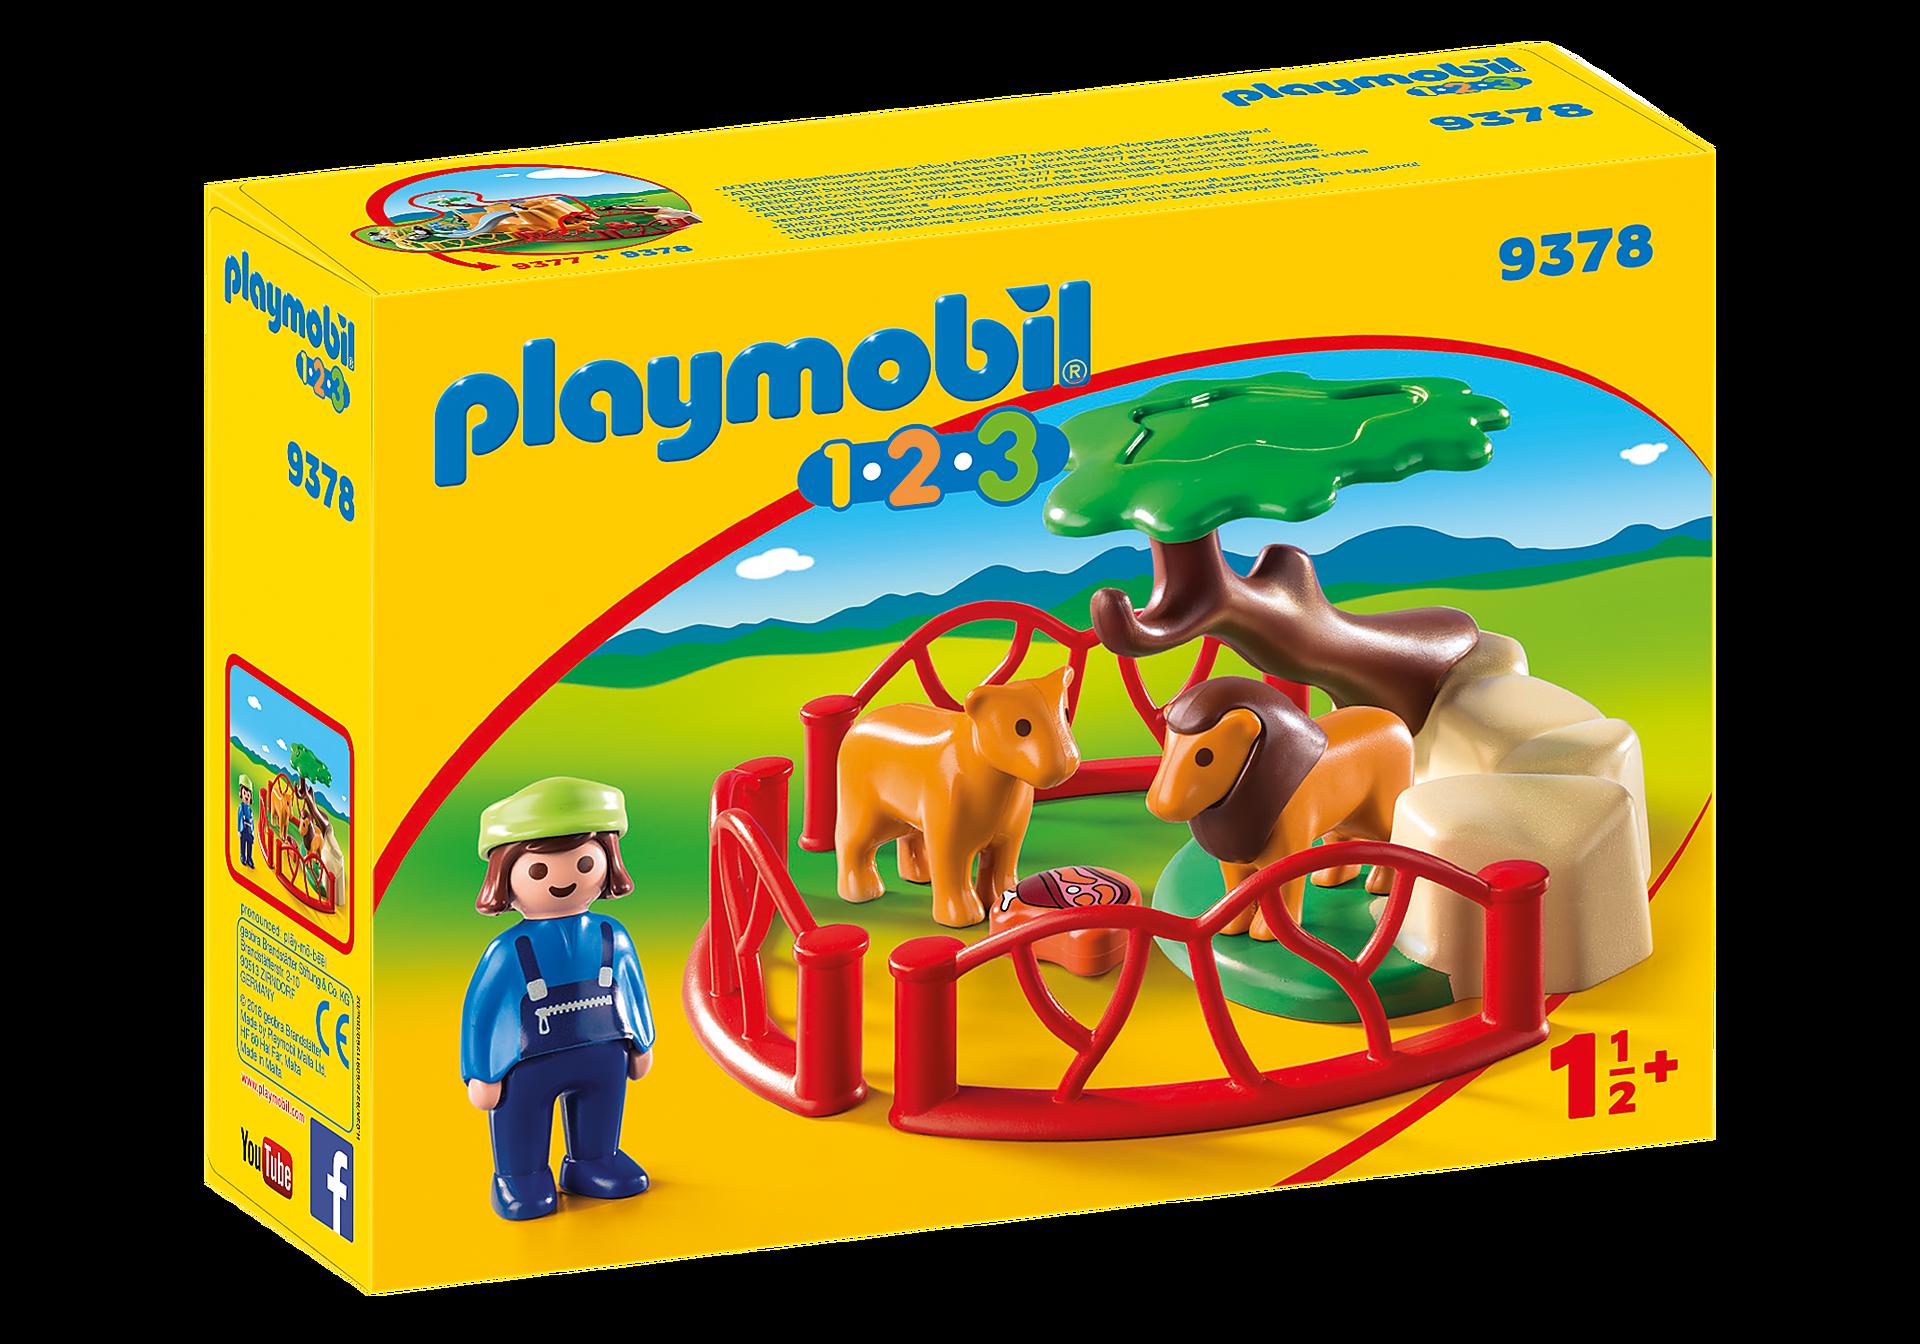 http://media.playmobil.com/i/playmobil/9378_product_box_front/Λιοντάρια Ζωολογικού Κήπου με περίφραξη